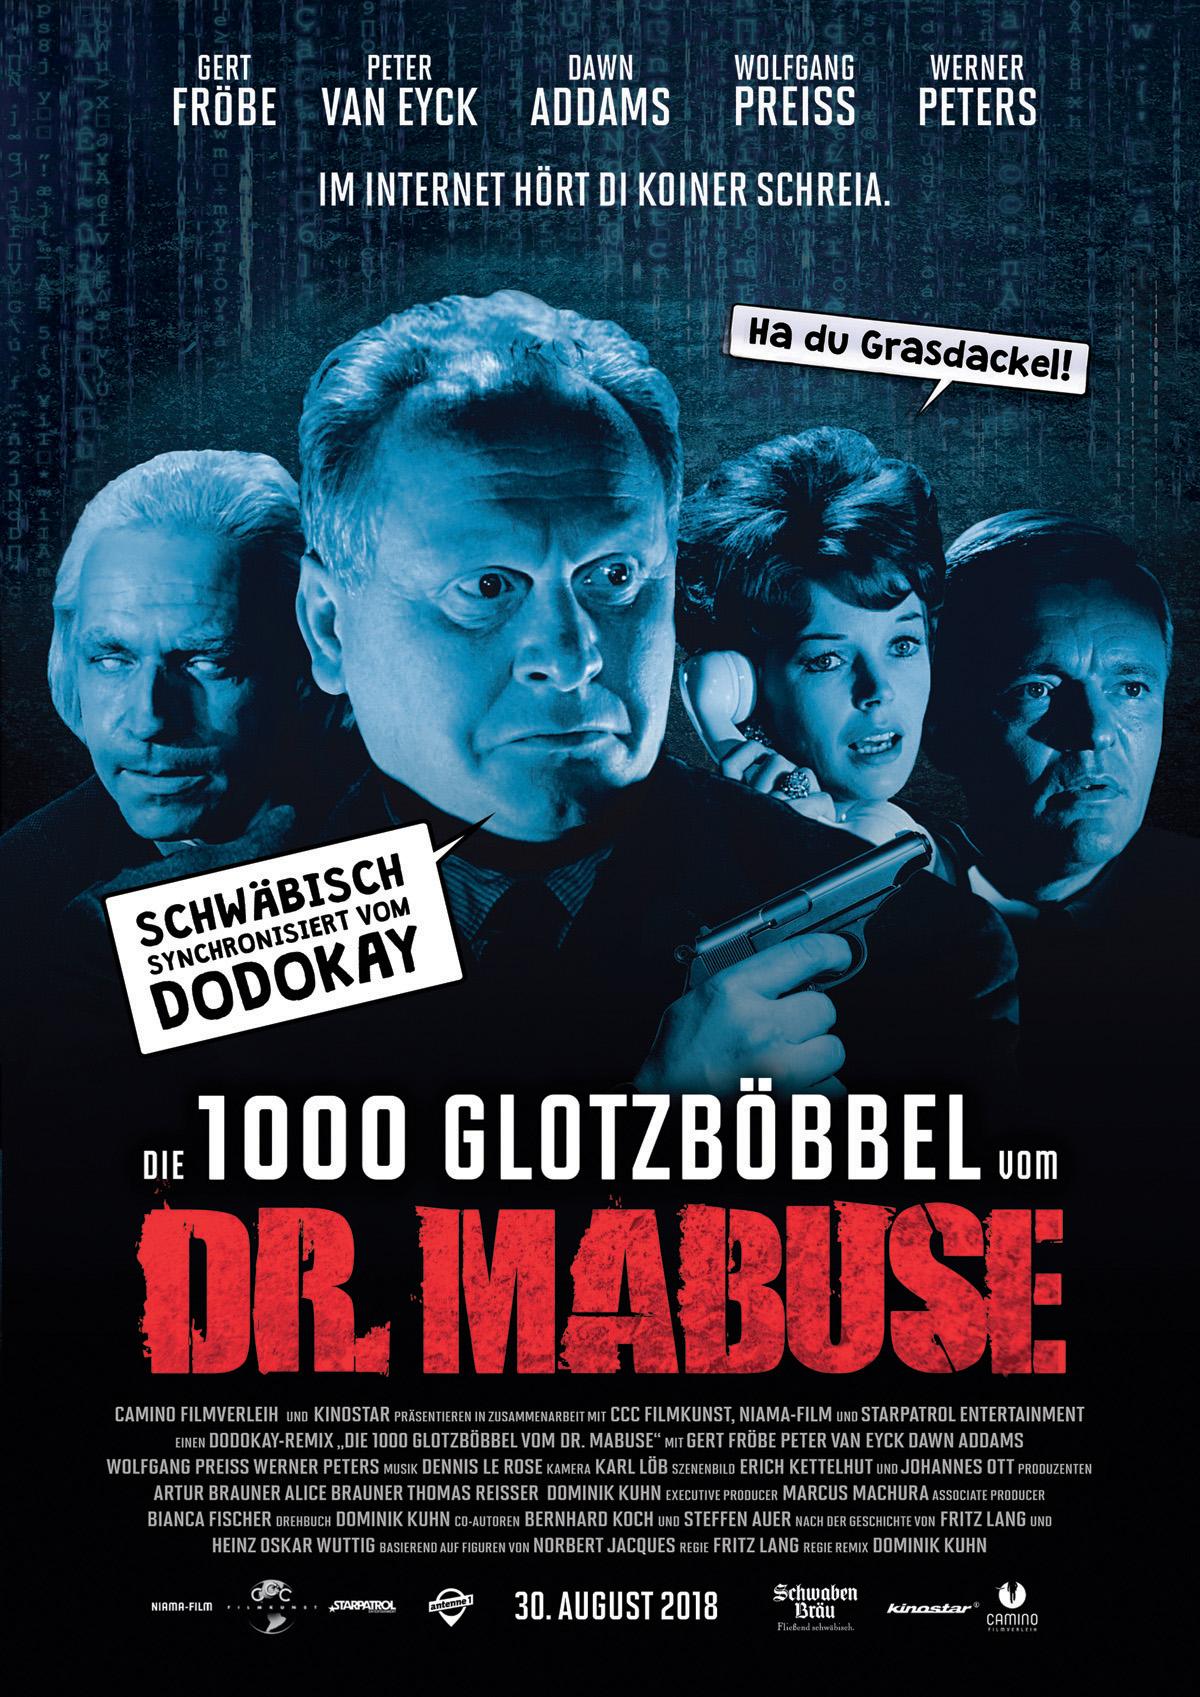 فیلم سینمایی Die 1000 Glotzböbbel vom Dr. Mabuse به کارگردانی فریتس لانگ و Dominik Kuhn